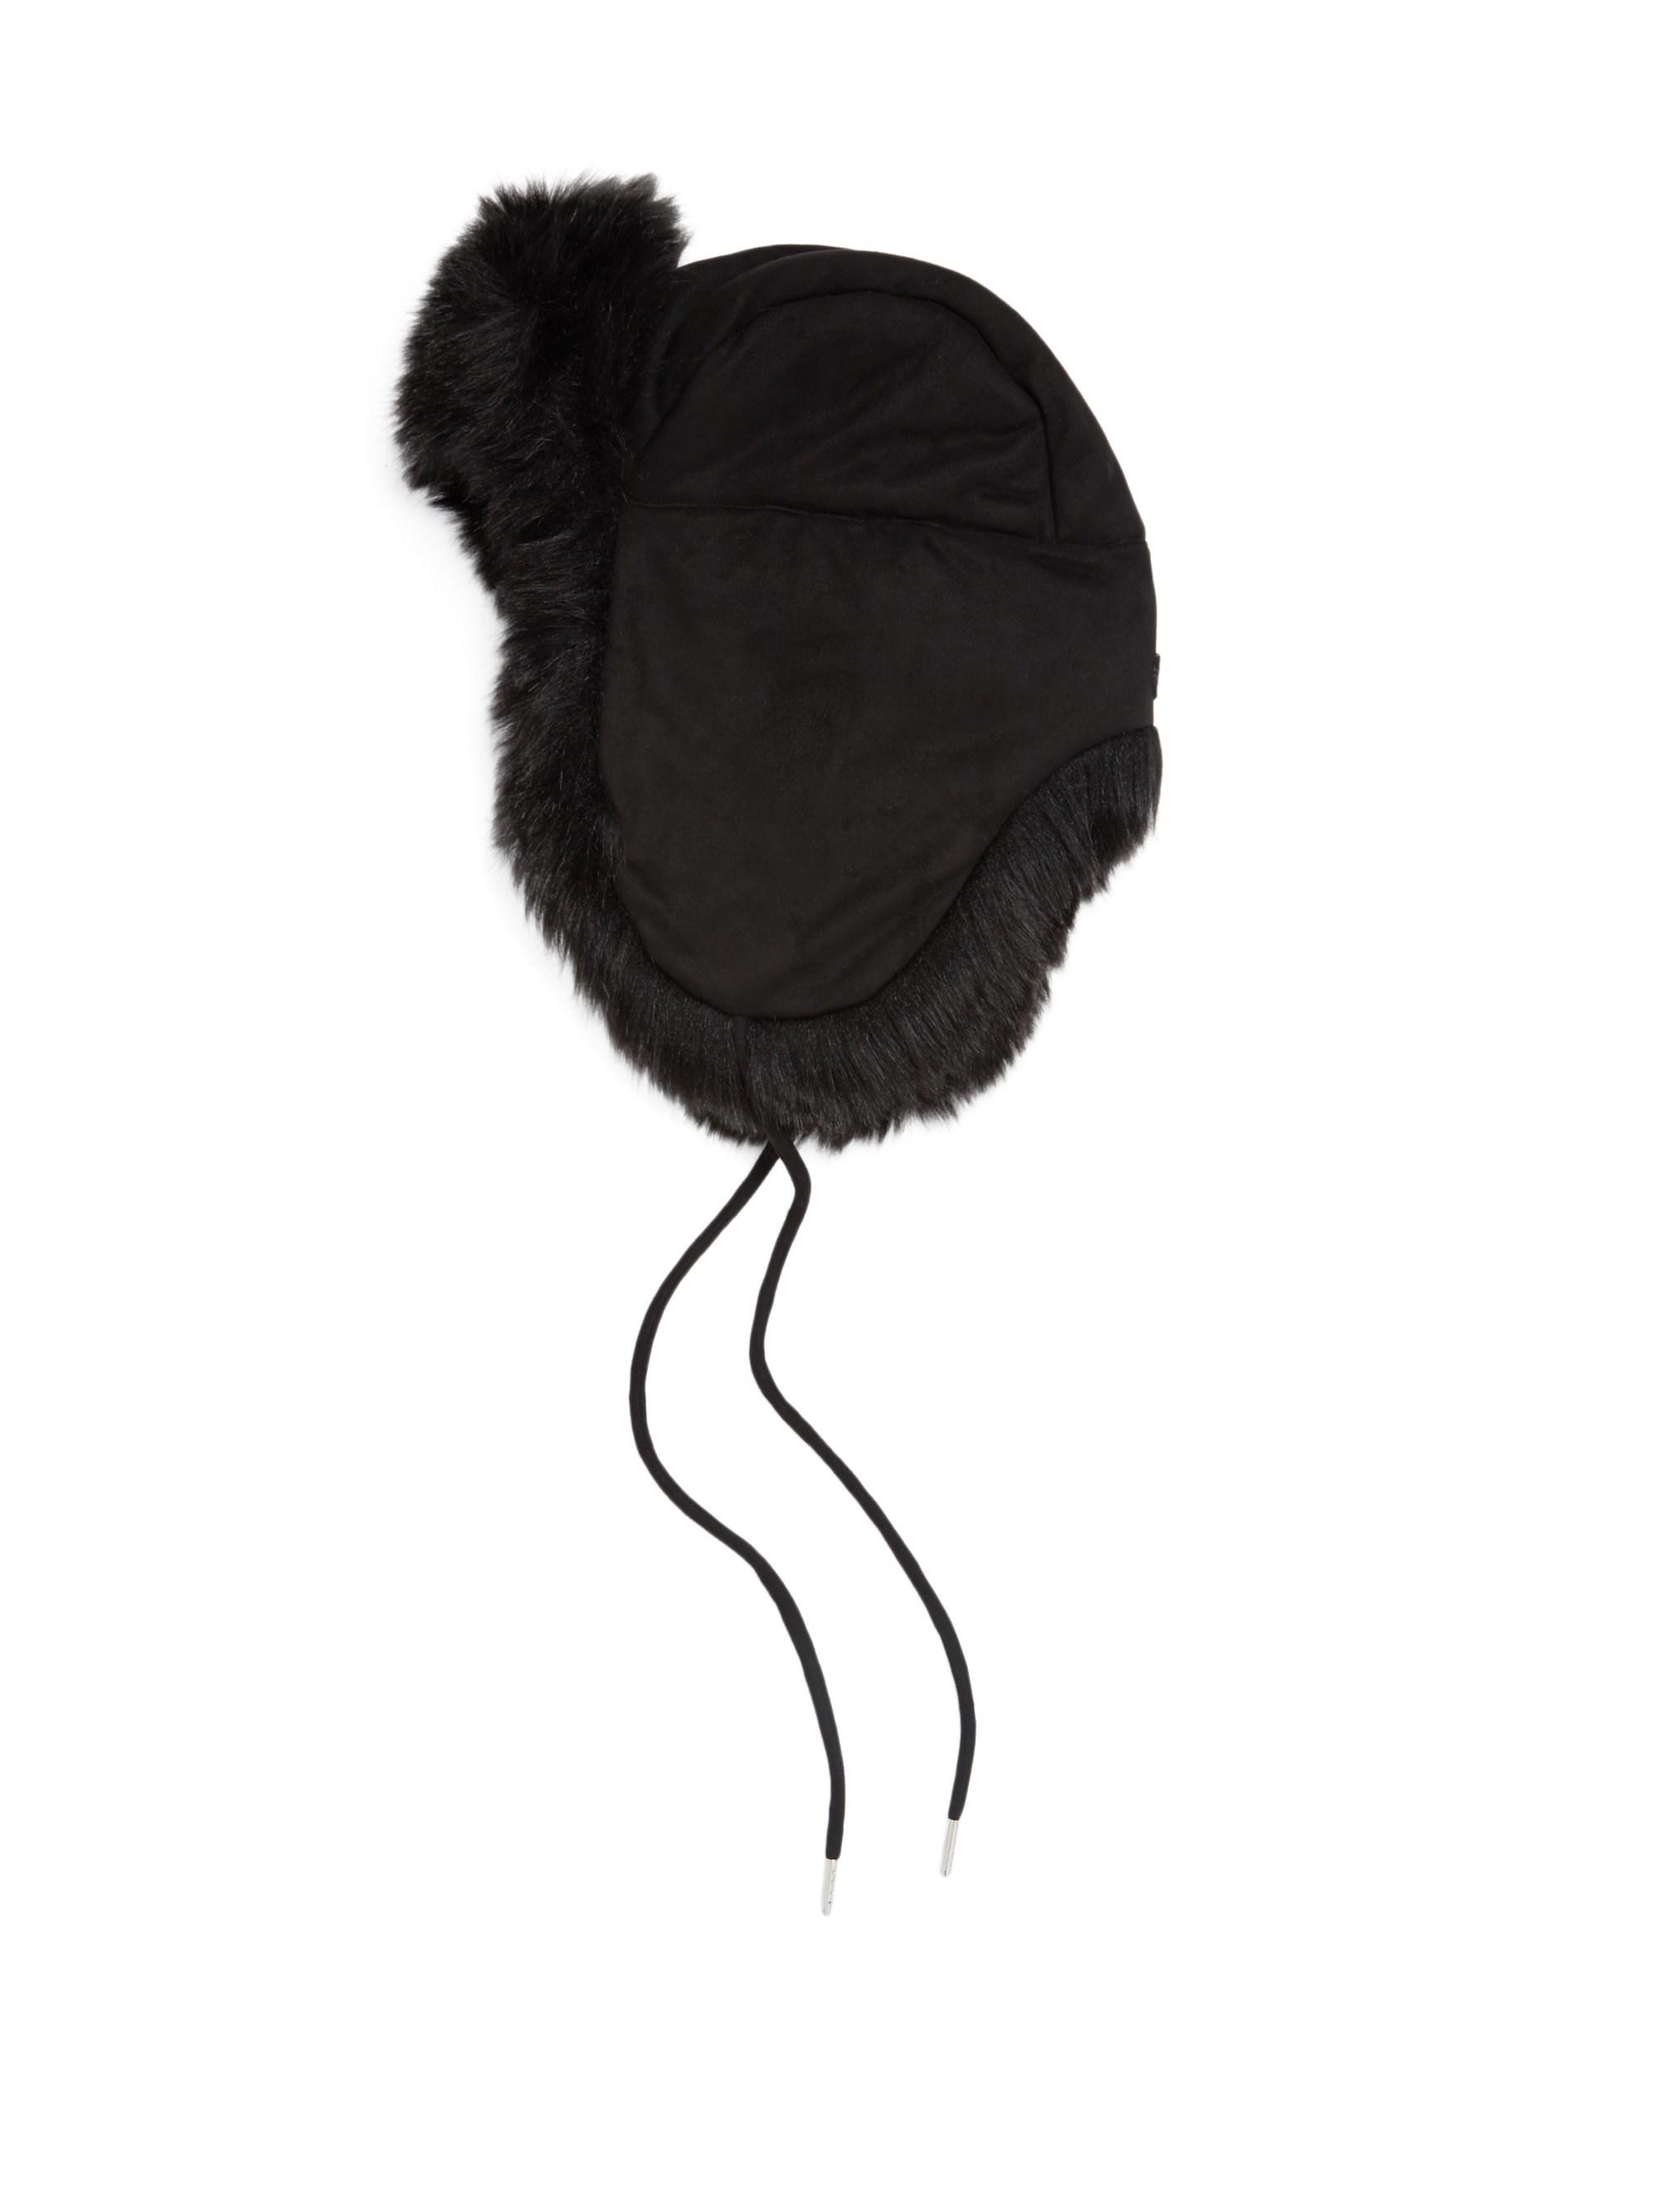 32137863f61 Charlotte Simone Women s Faux Fur Trapper Hat - Black in Black - Lyst